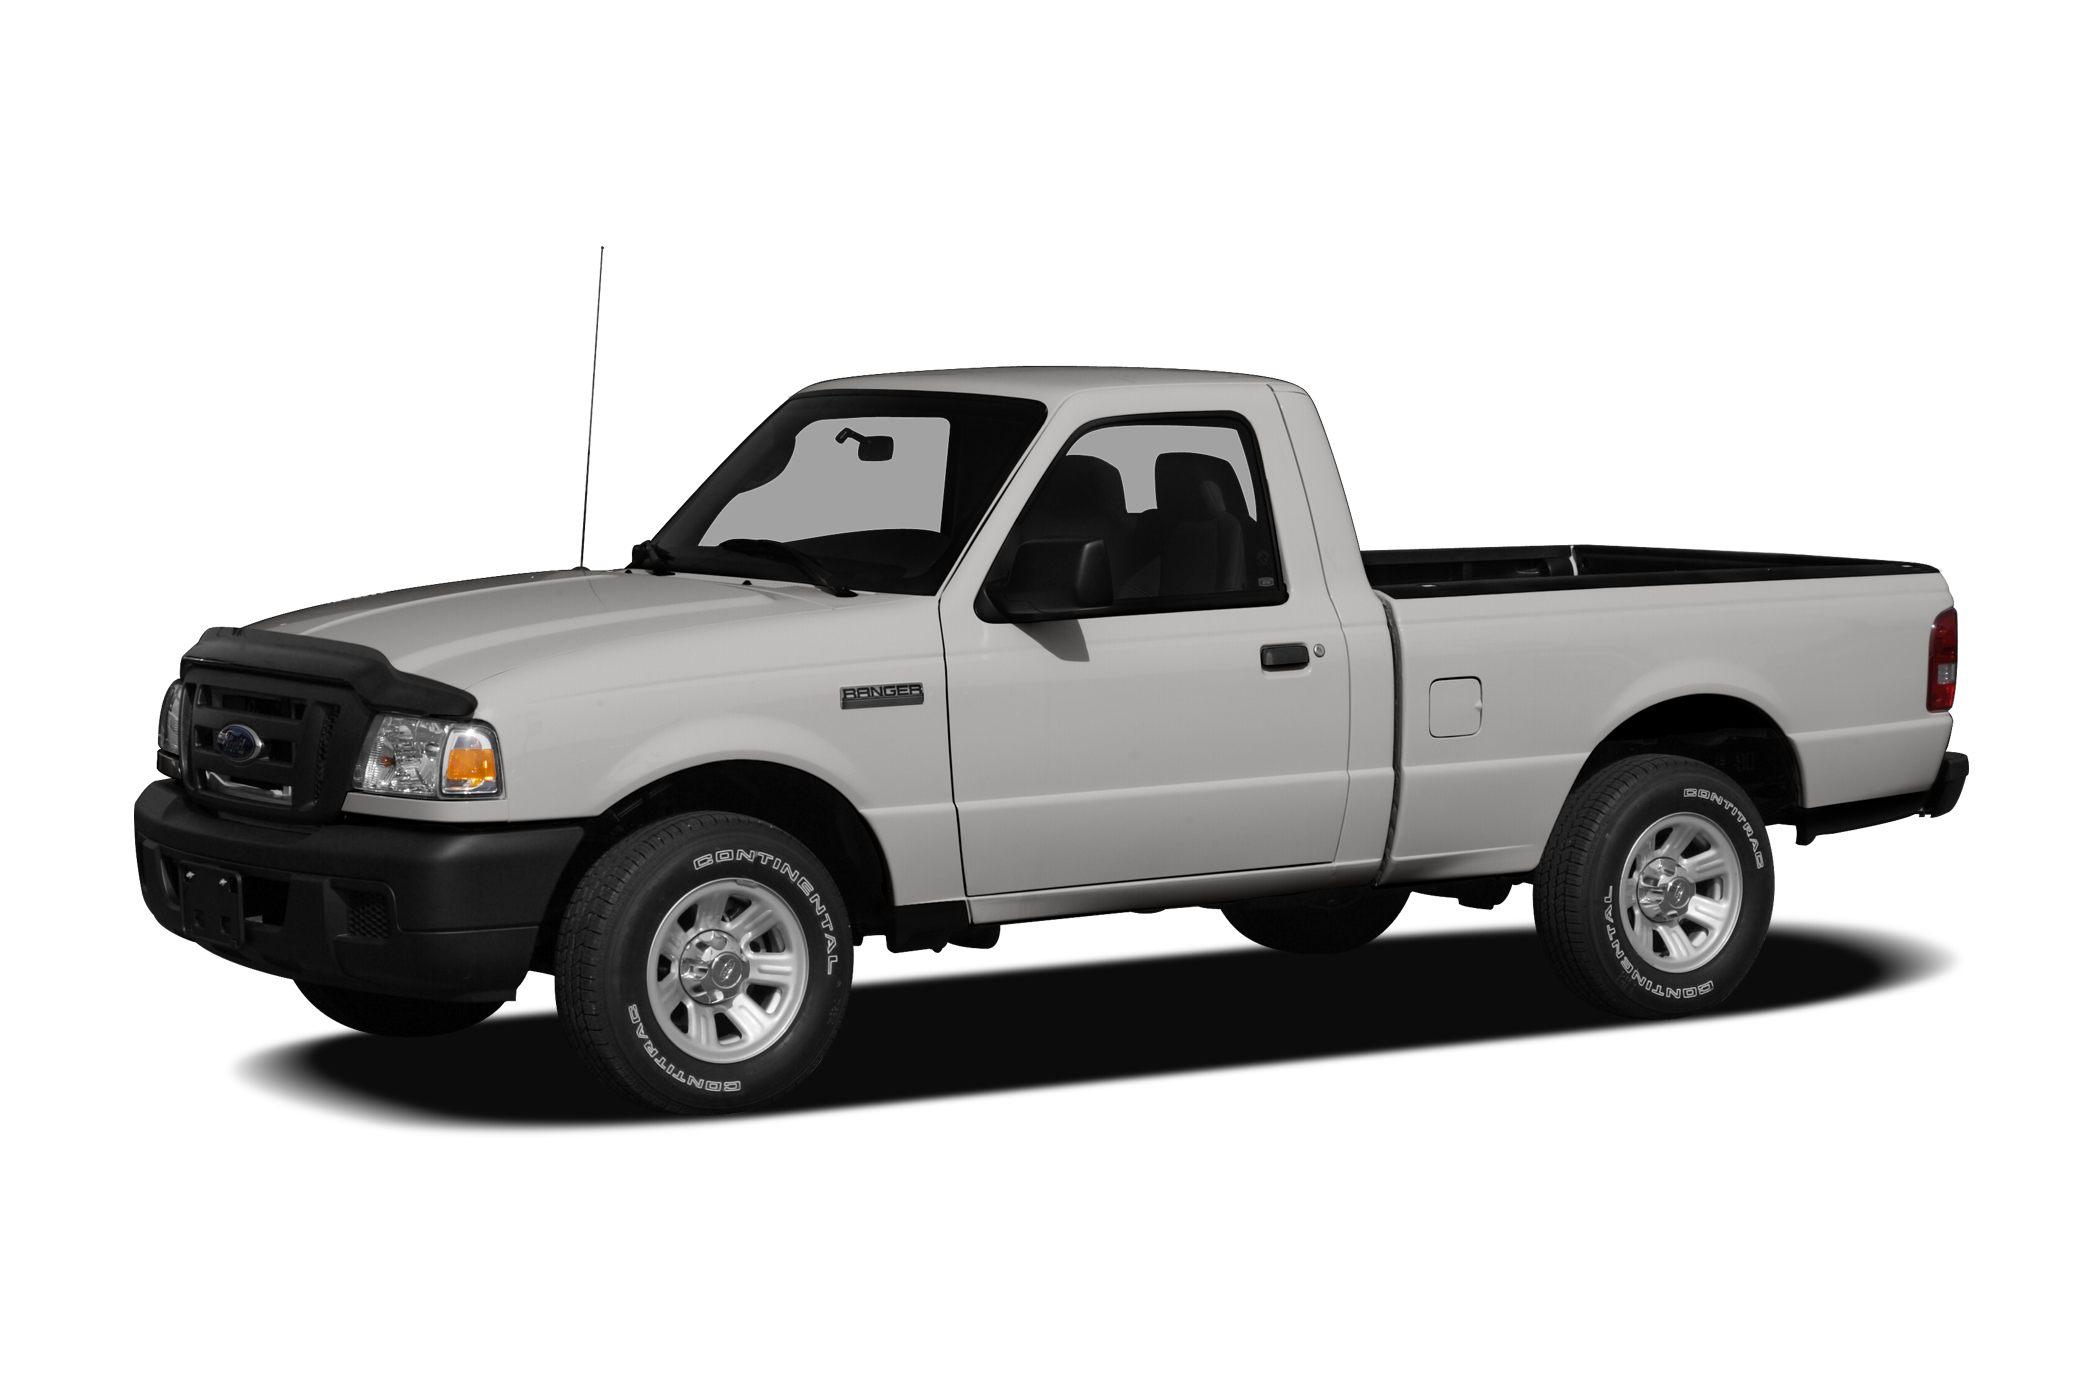 2008 Ford Ranger Sport Regular Cab Pickup for sale in Jemison for $4,990 with 220,424 miles